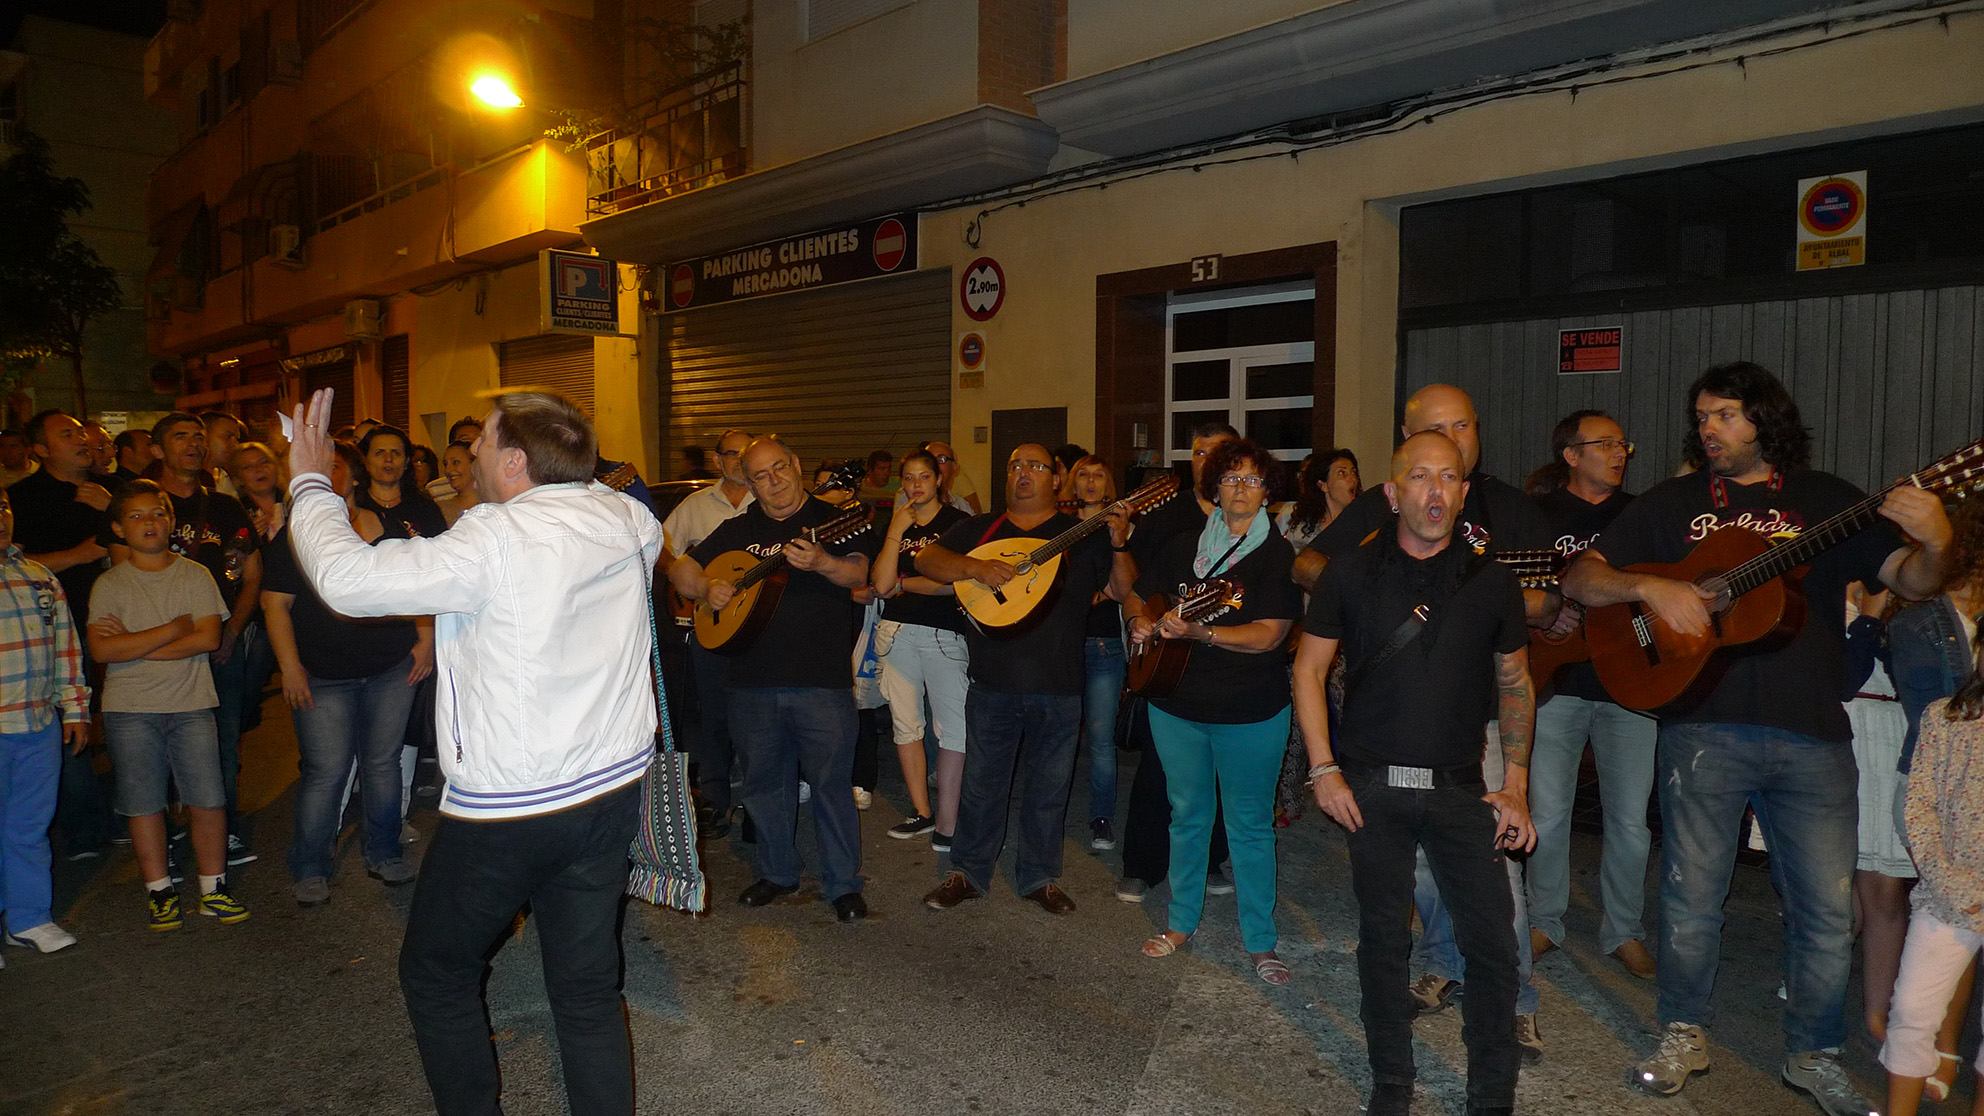 2014-06-07-Albaes d'Albal-Desemparats07 (41)